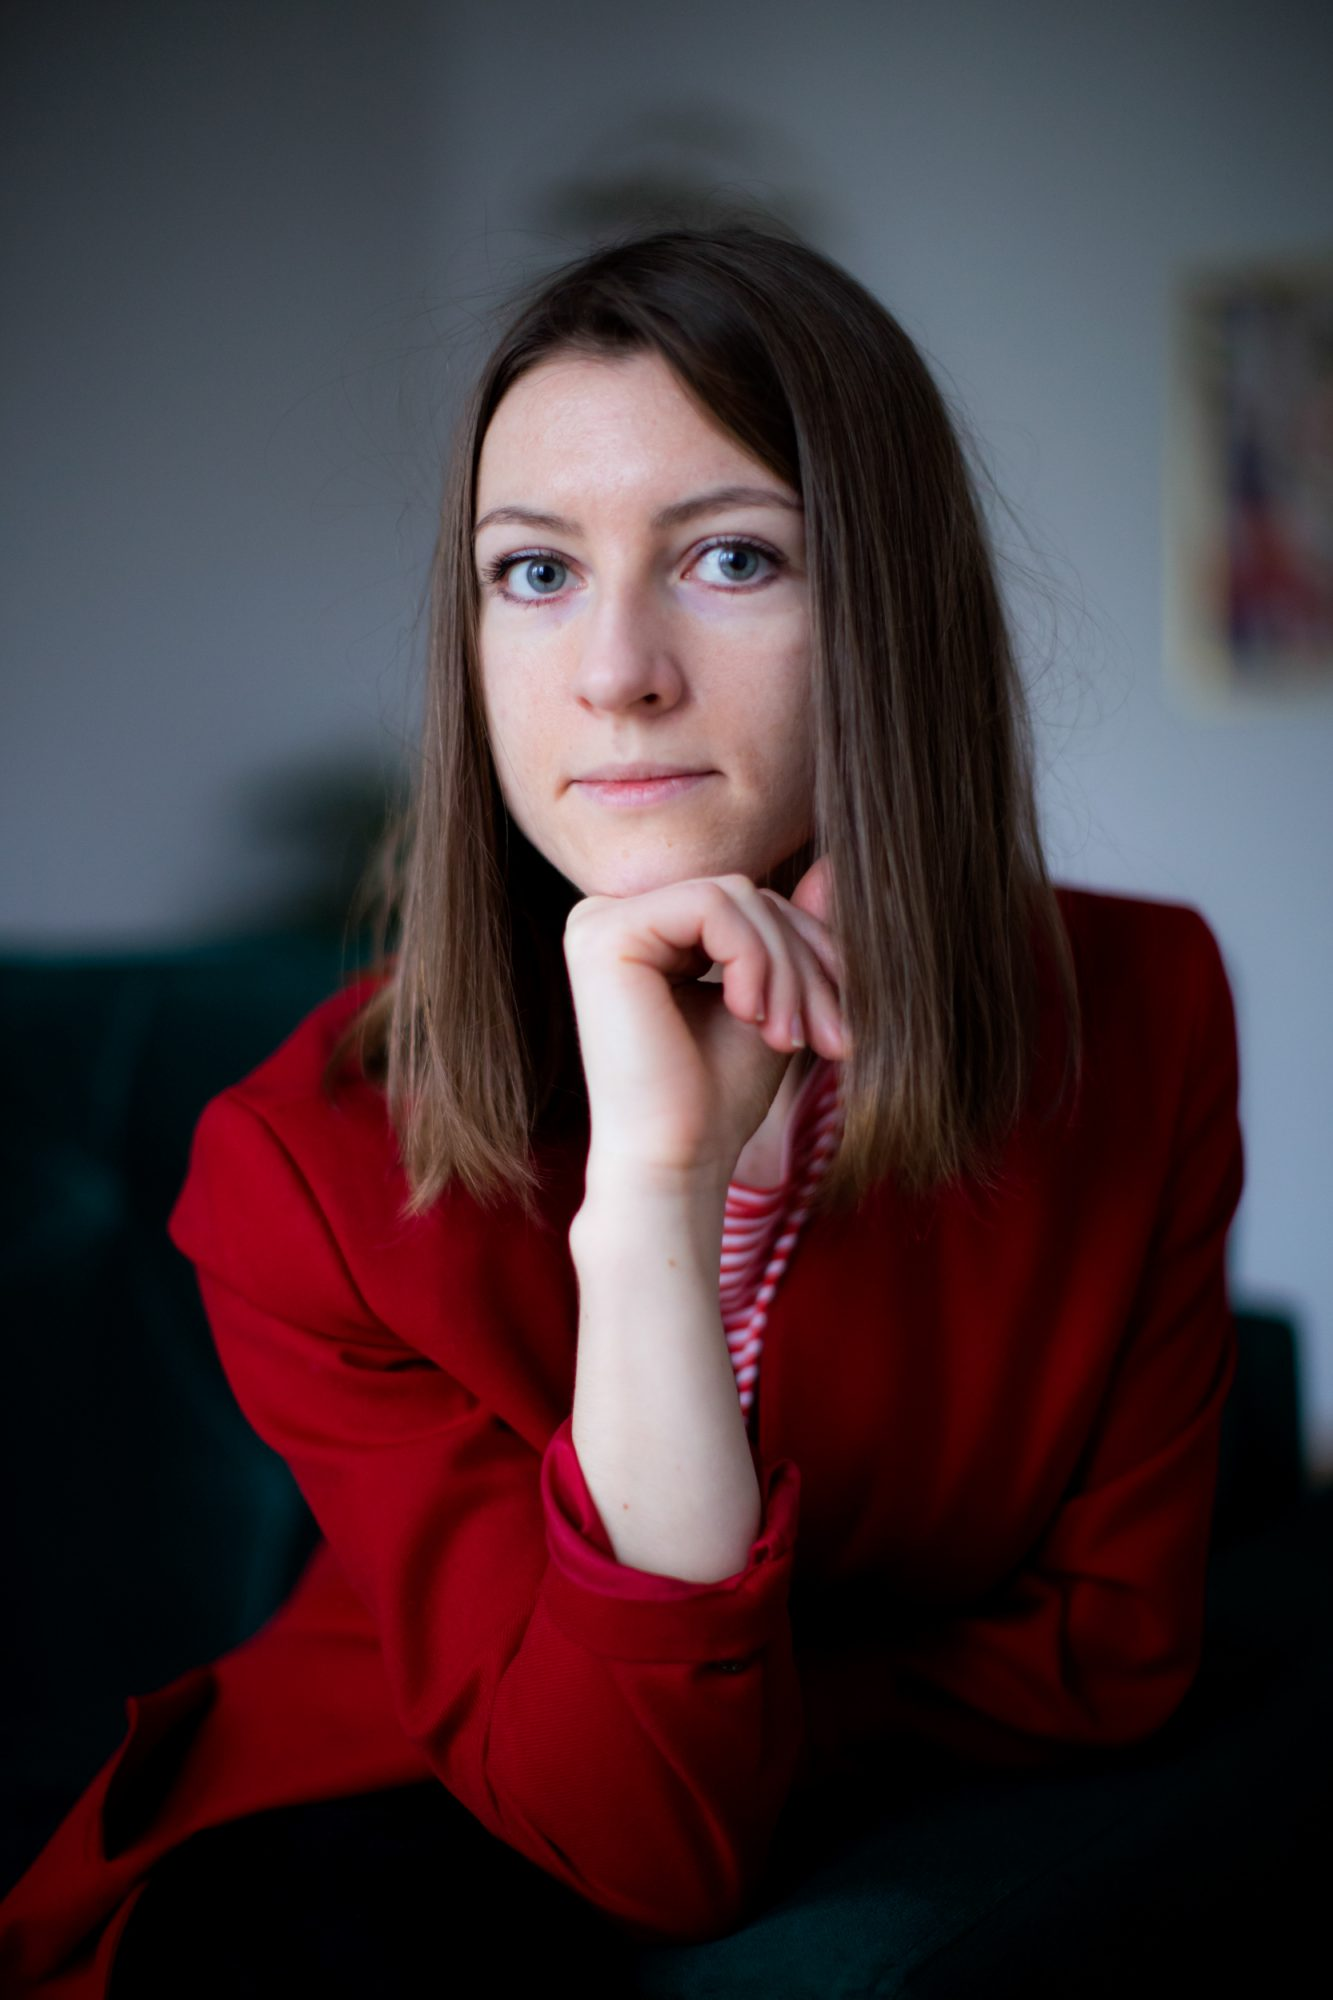 Justyna 72 dpi (internet) (4 of 18)